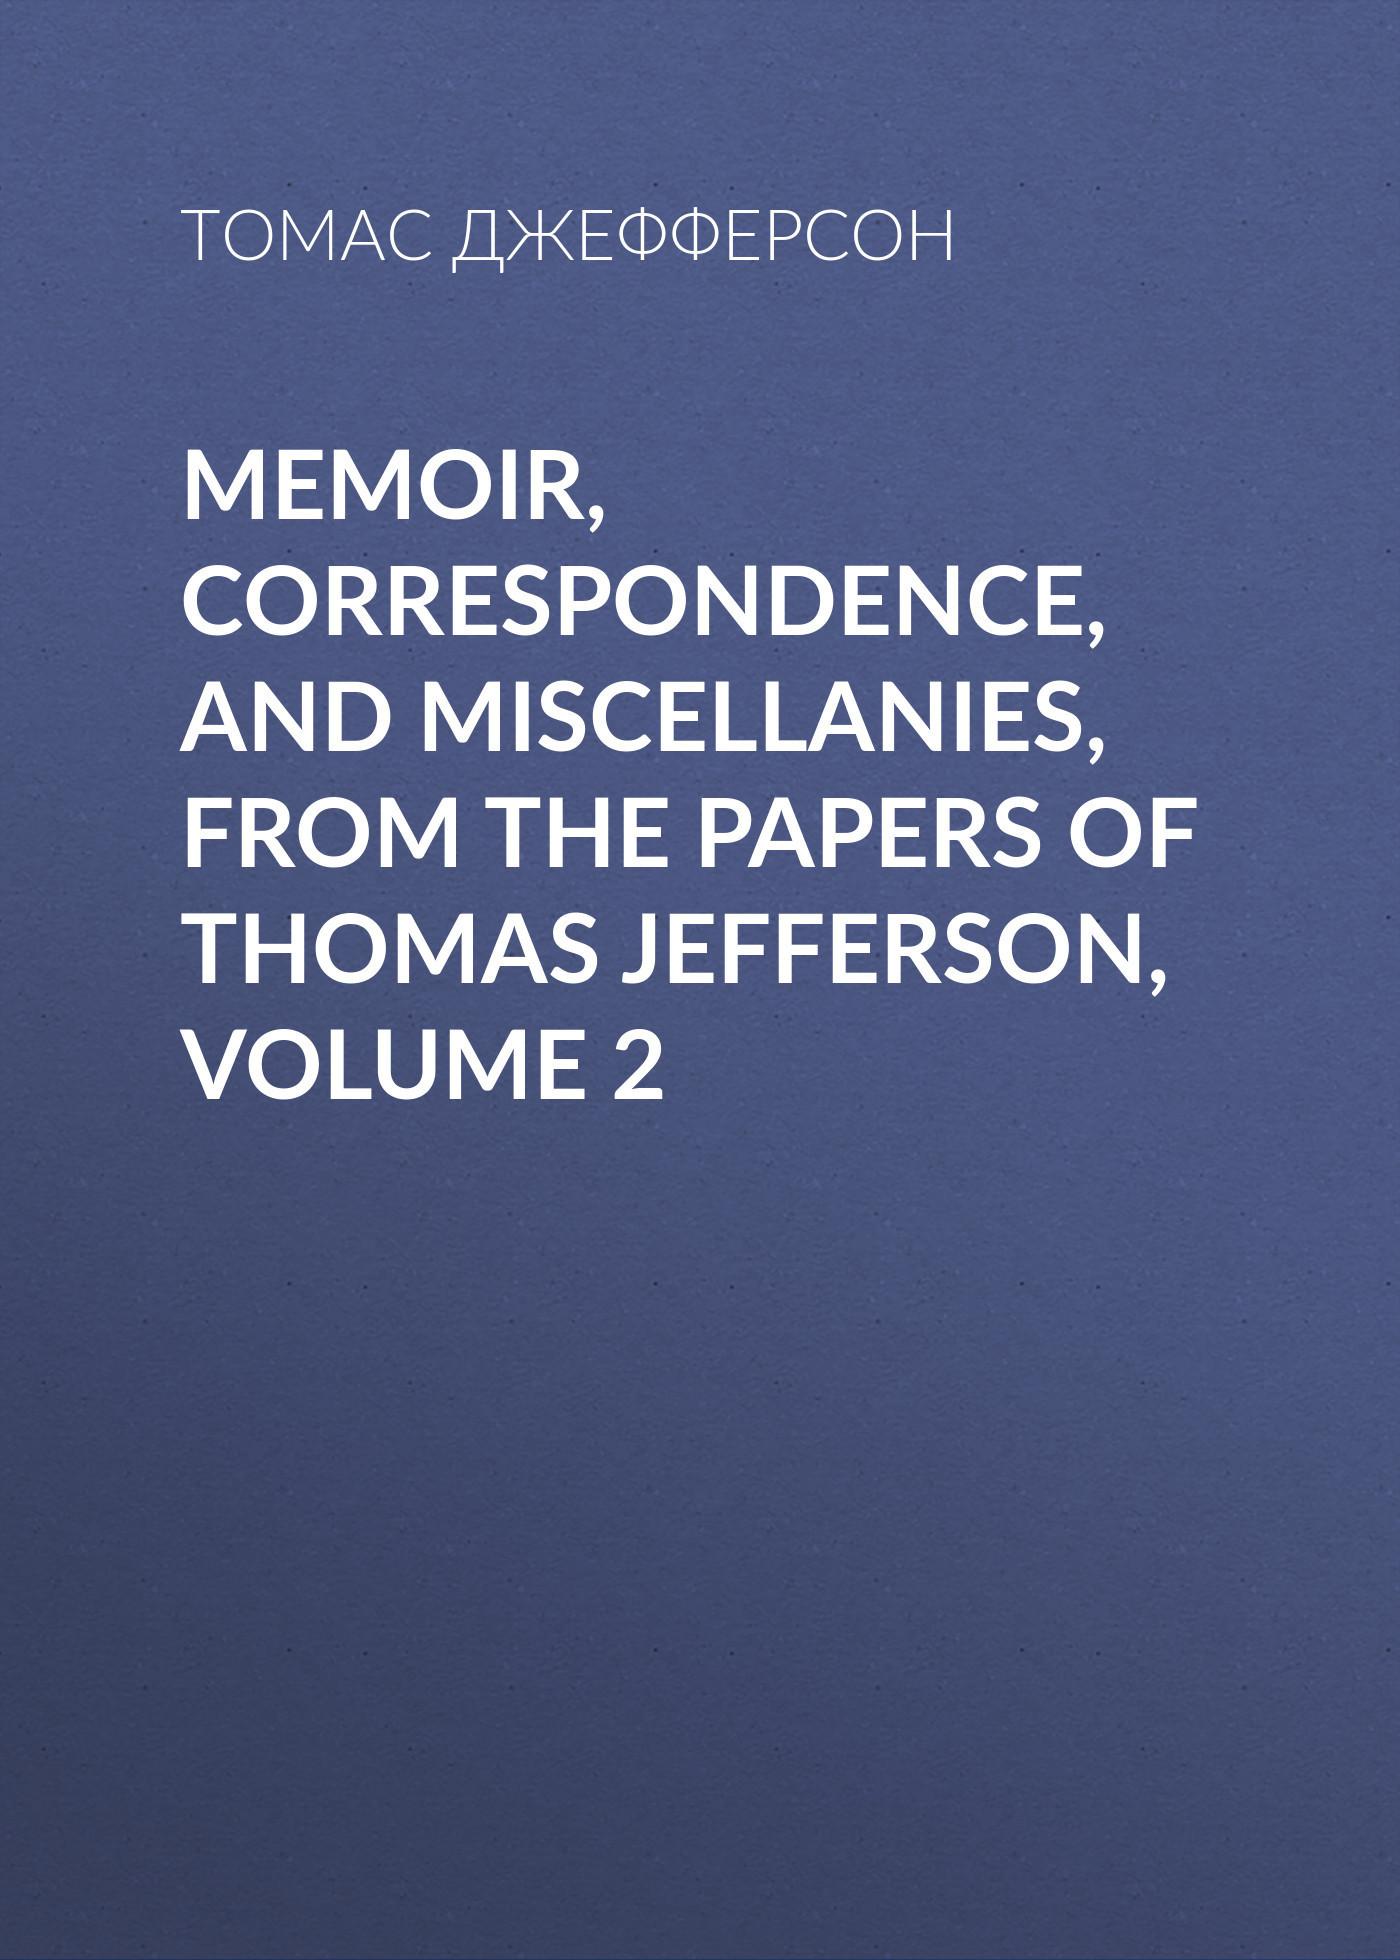 Томас Джефферсон Memoir, Correspondence, And Miscellanies, From The Papers Of Thomas Jefferson, Volume 2